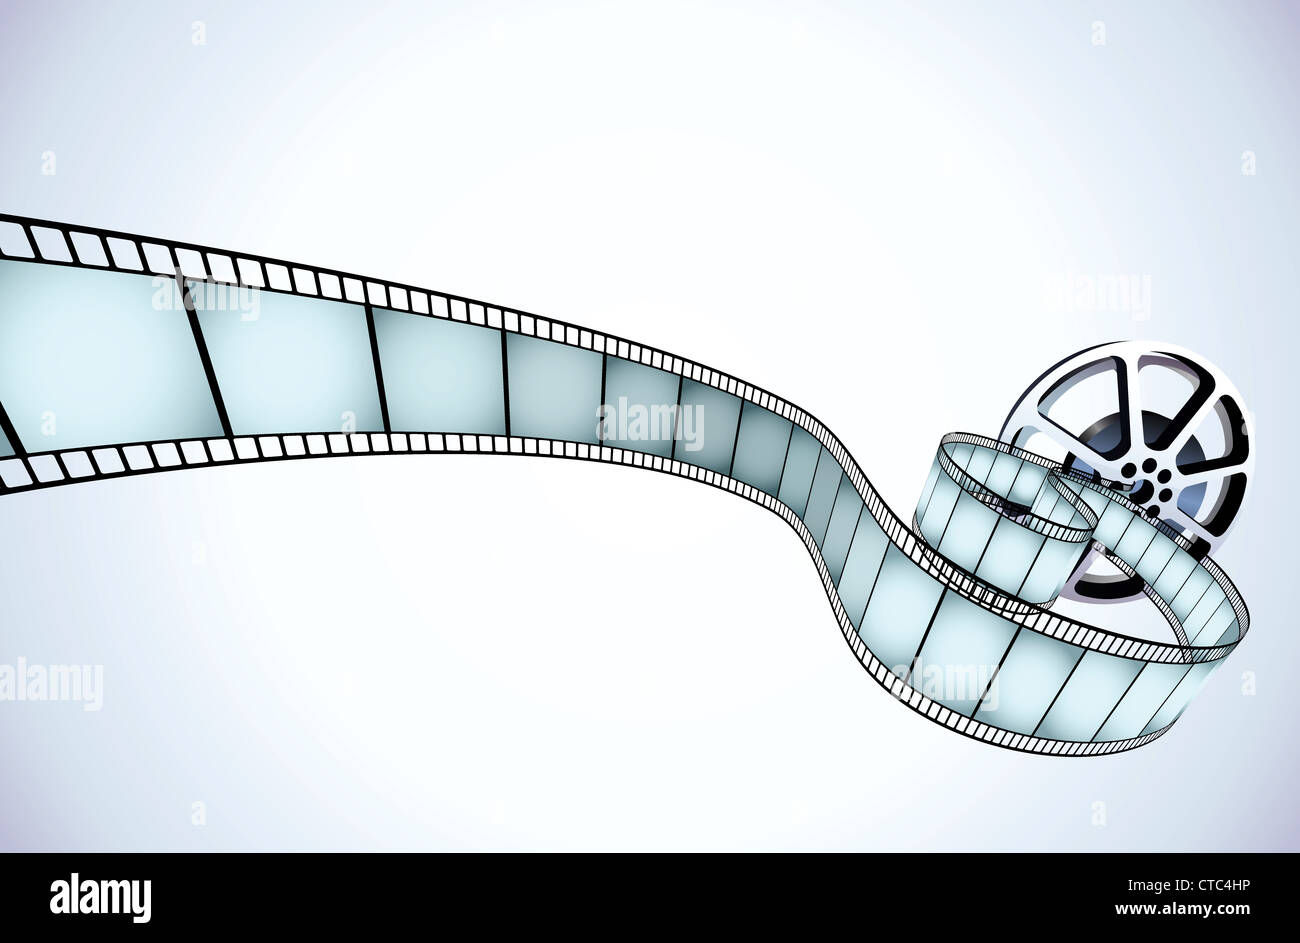 Movie Frames Stock Photos & Movie Frames Stock Images - Alamy